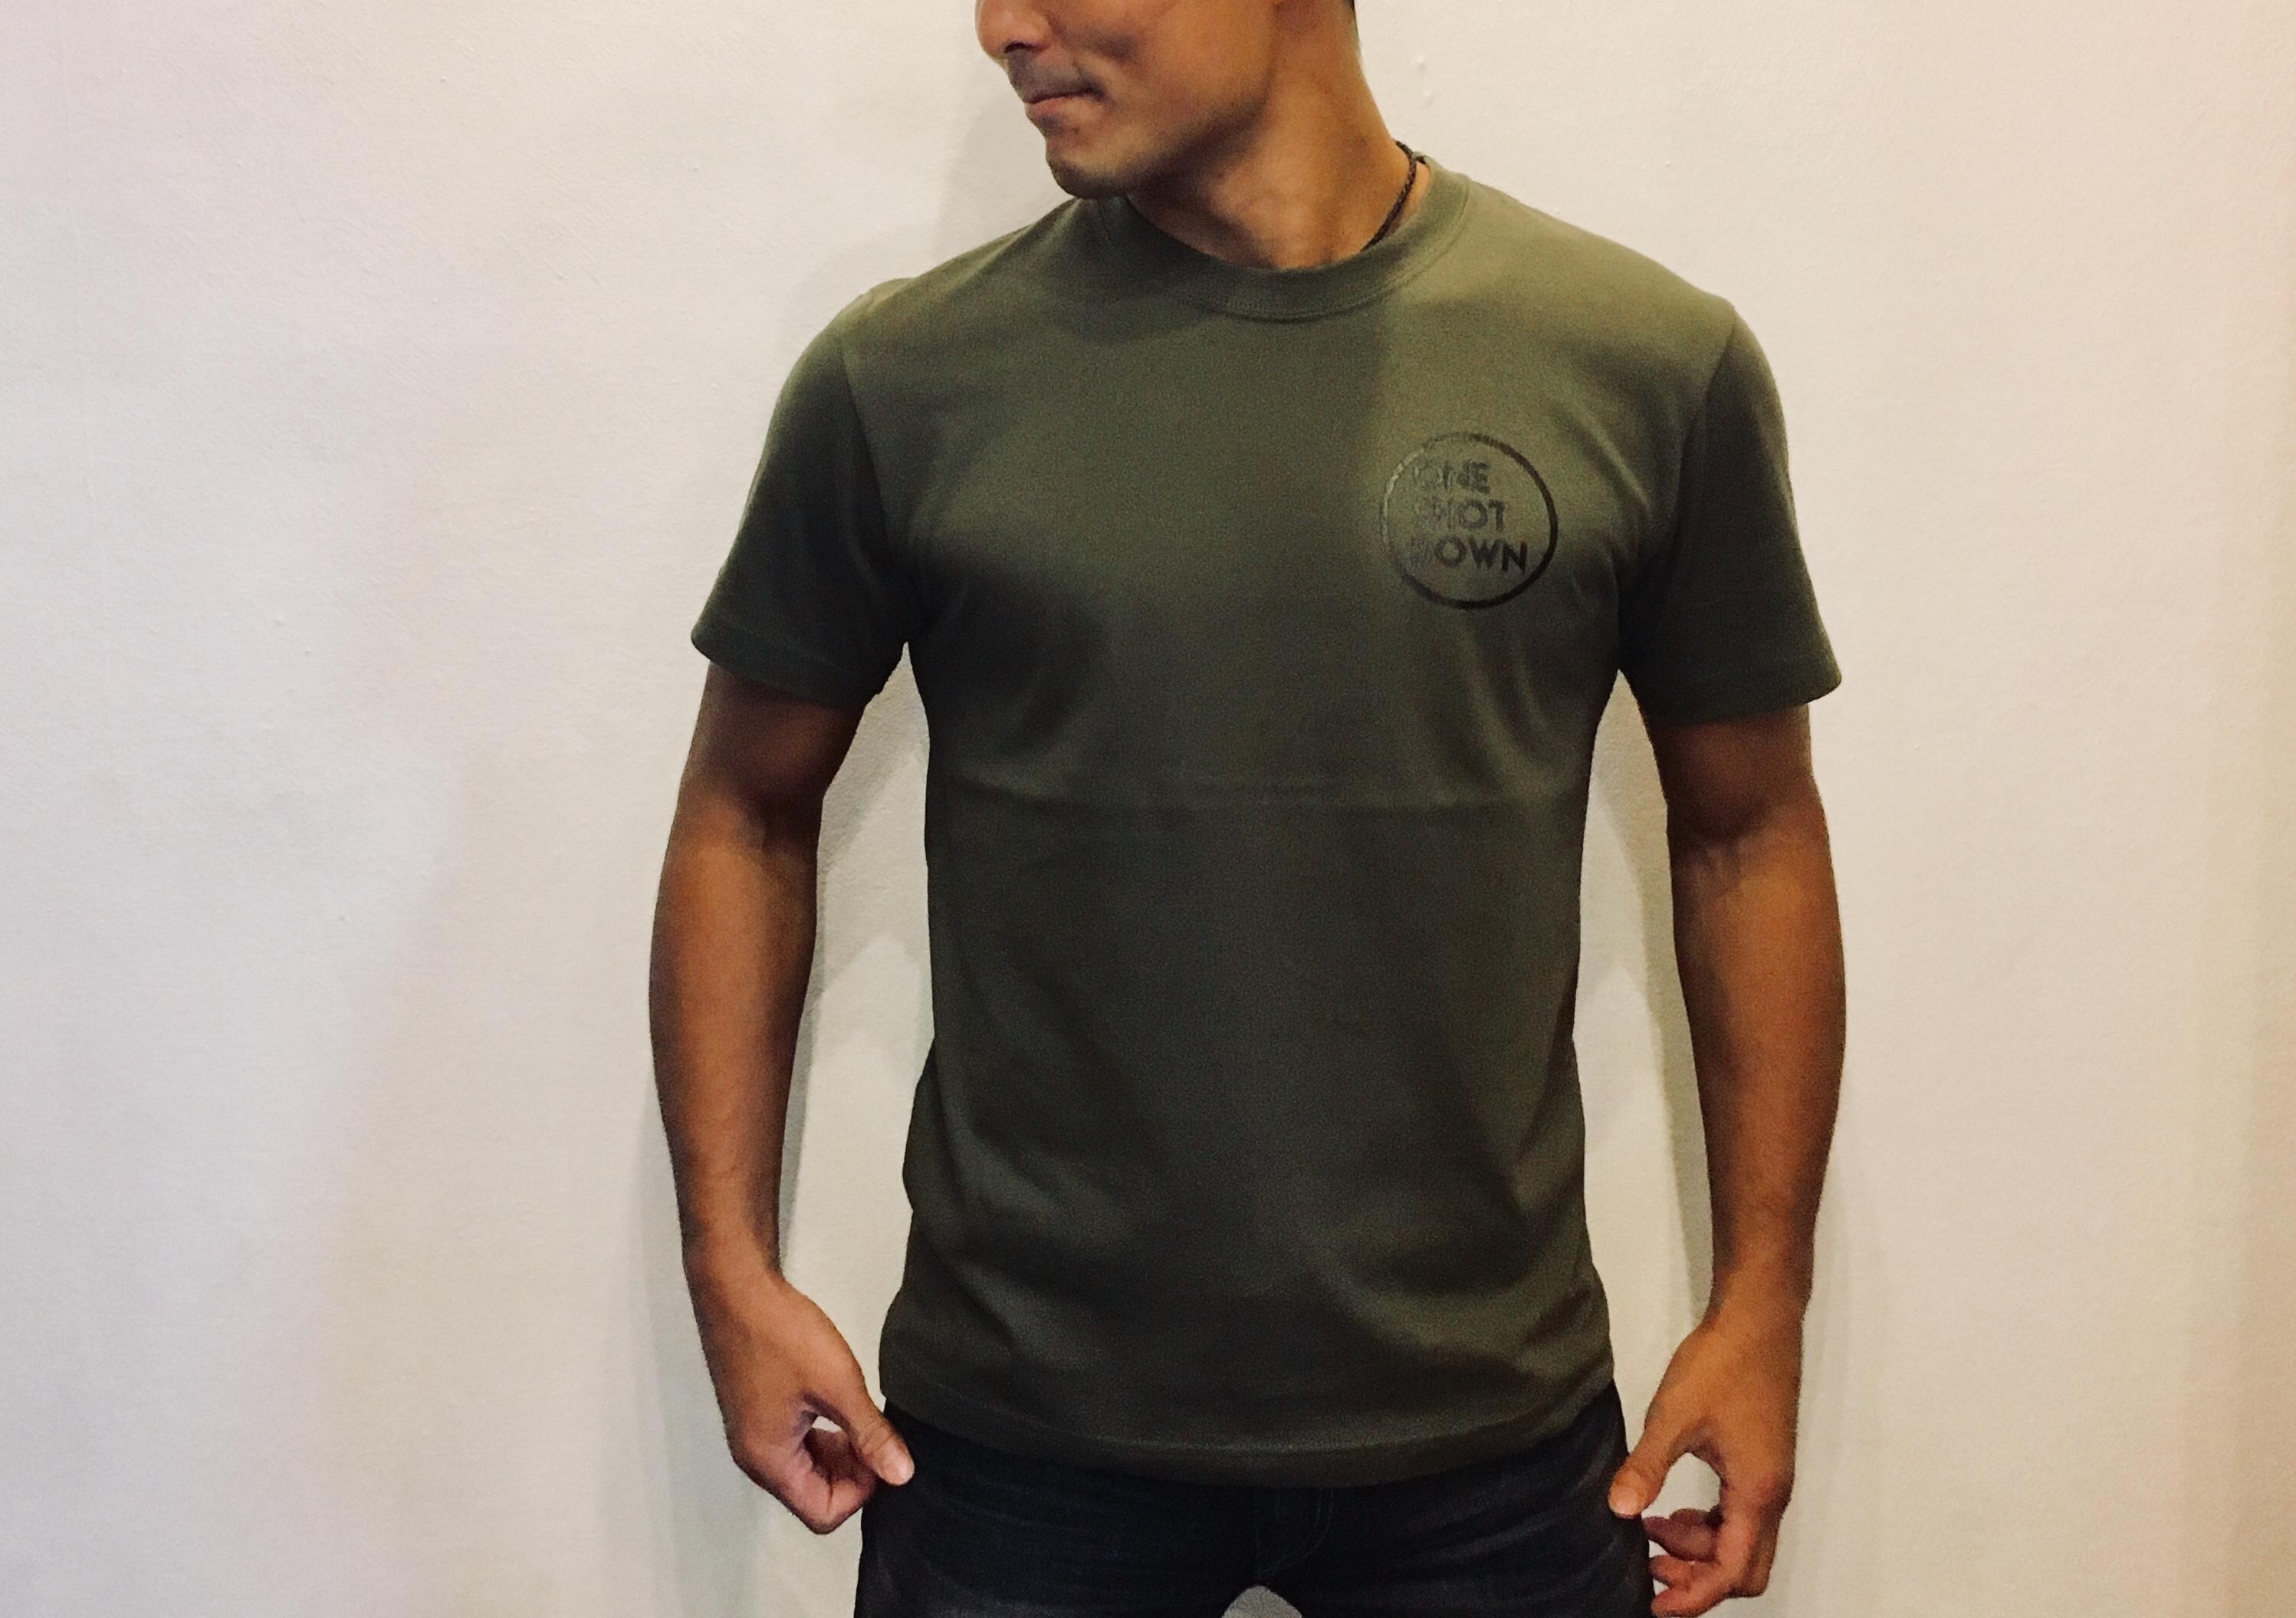 ONESHOTDOWN サークルロゴ Tシャツ - 画像5